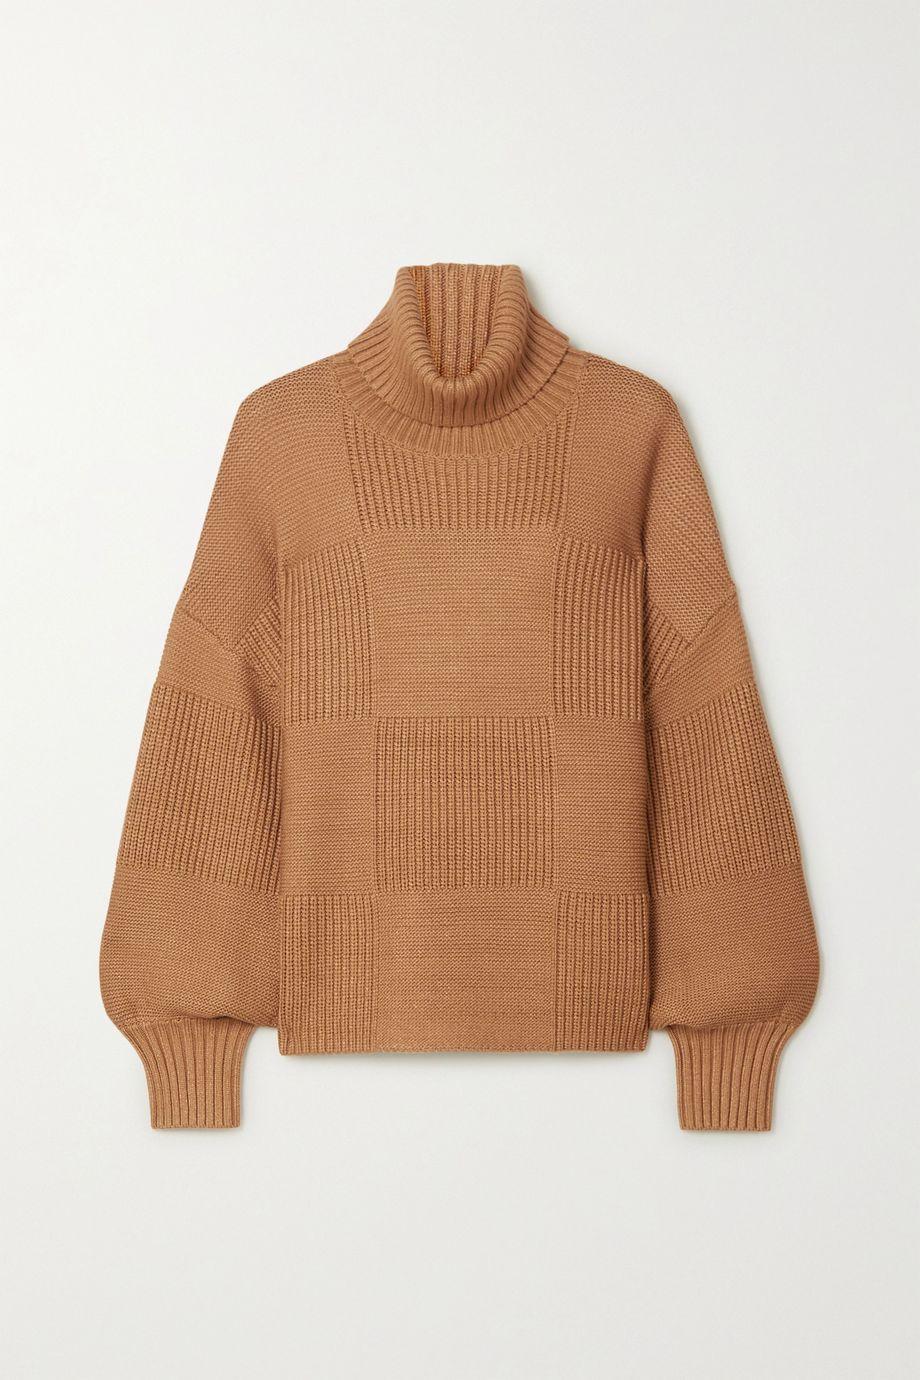 STAUD Benny ribbed-knit turtleneck sweater